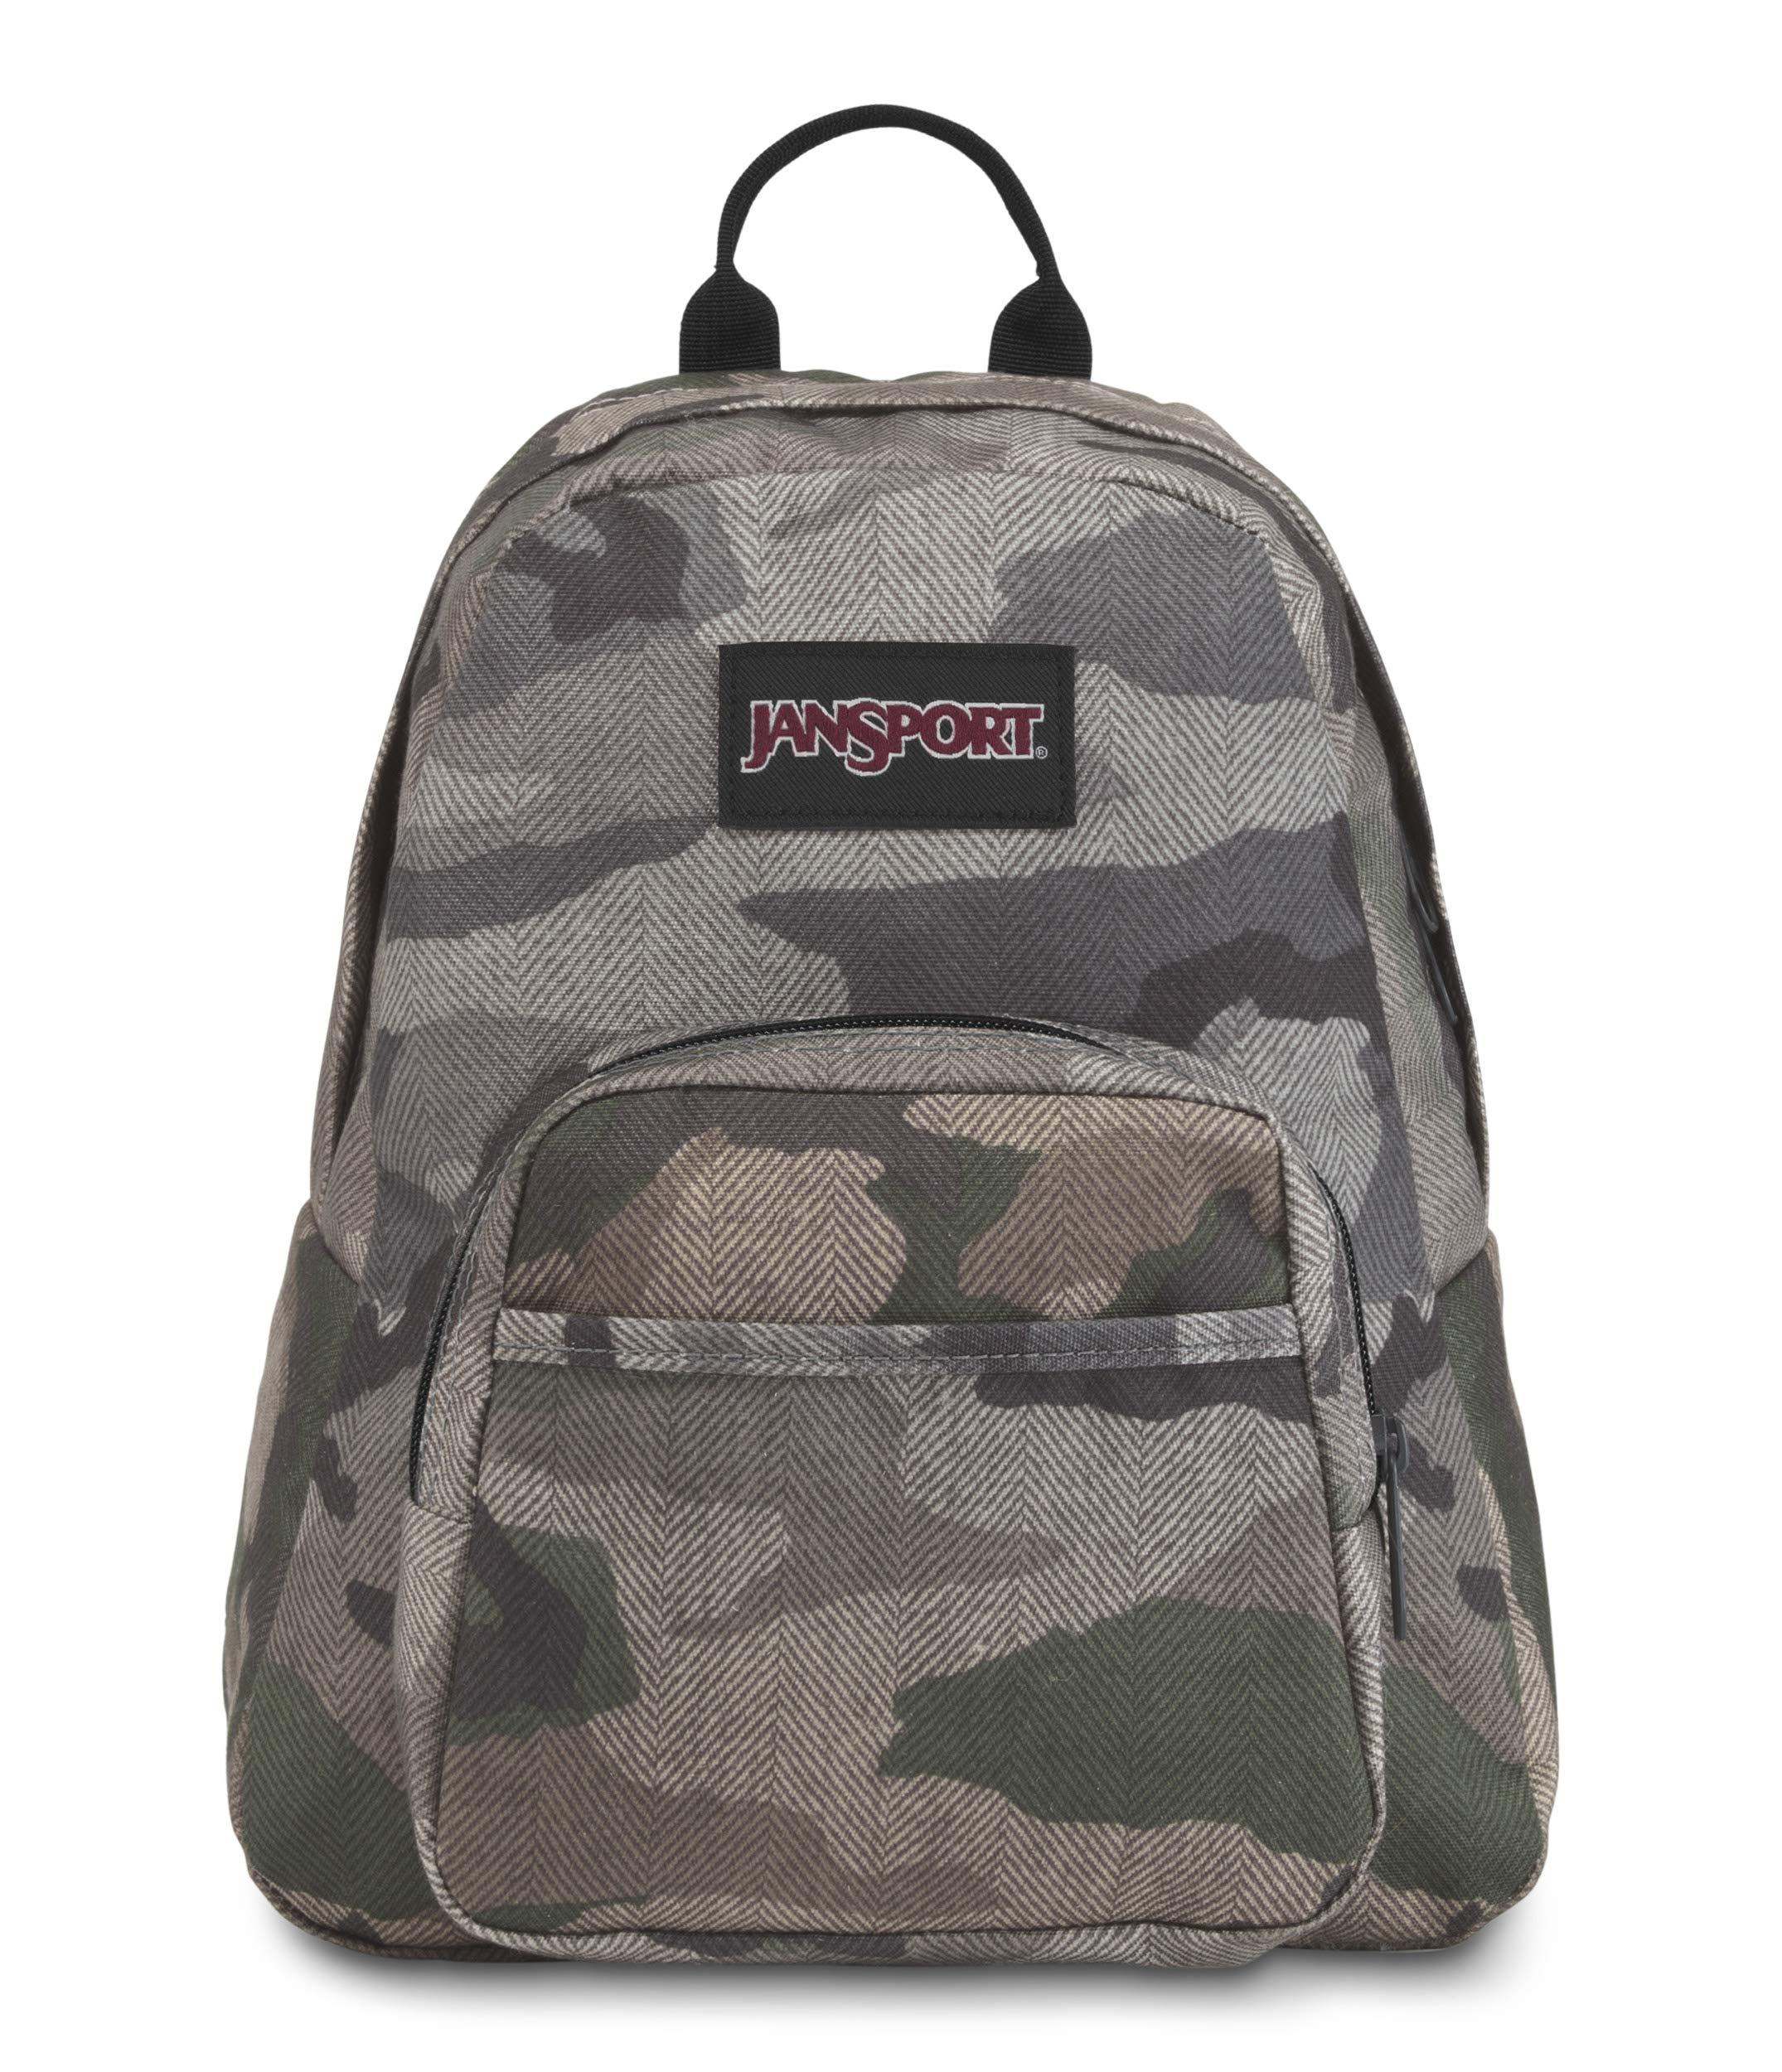 JanSport Half Pint FX Mini Backpack (Camo Ombre)